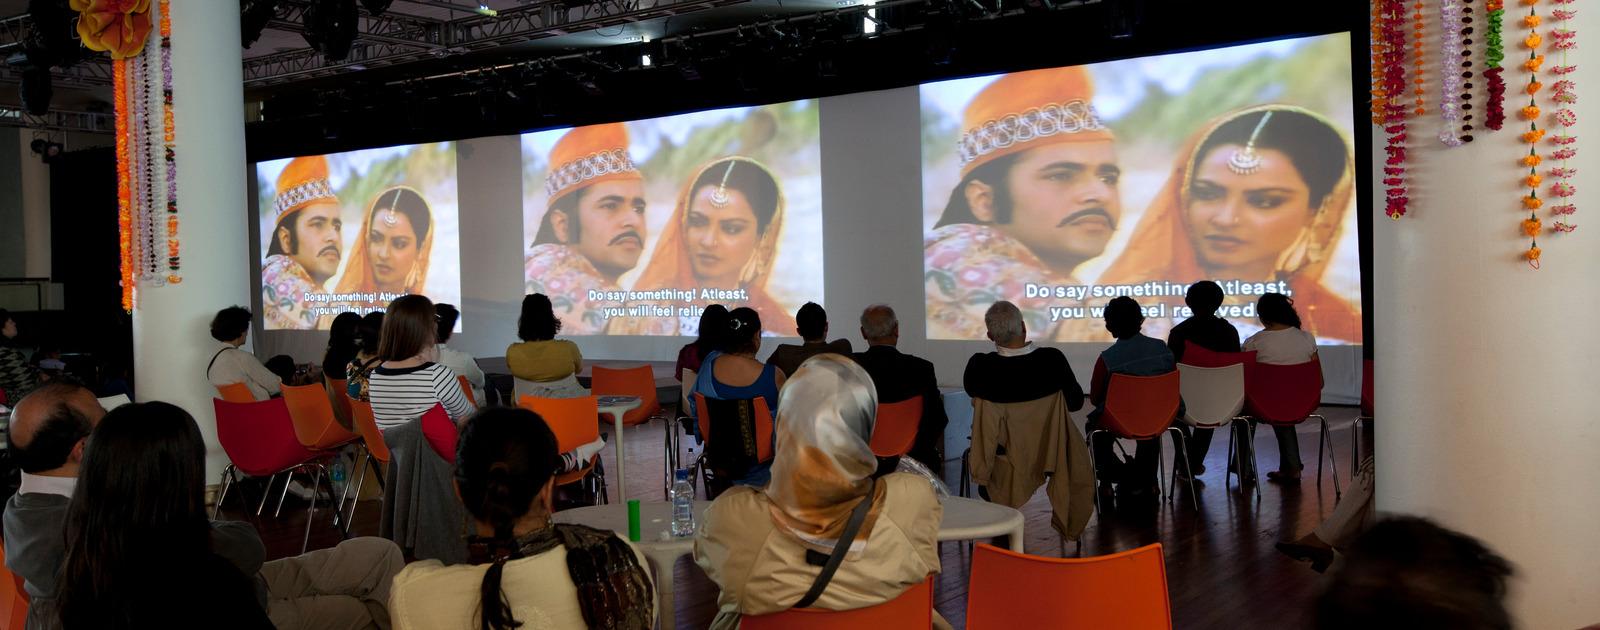 Audience Watching Films